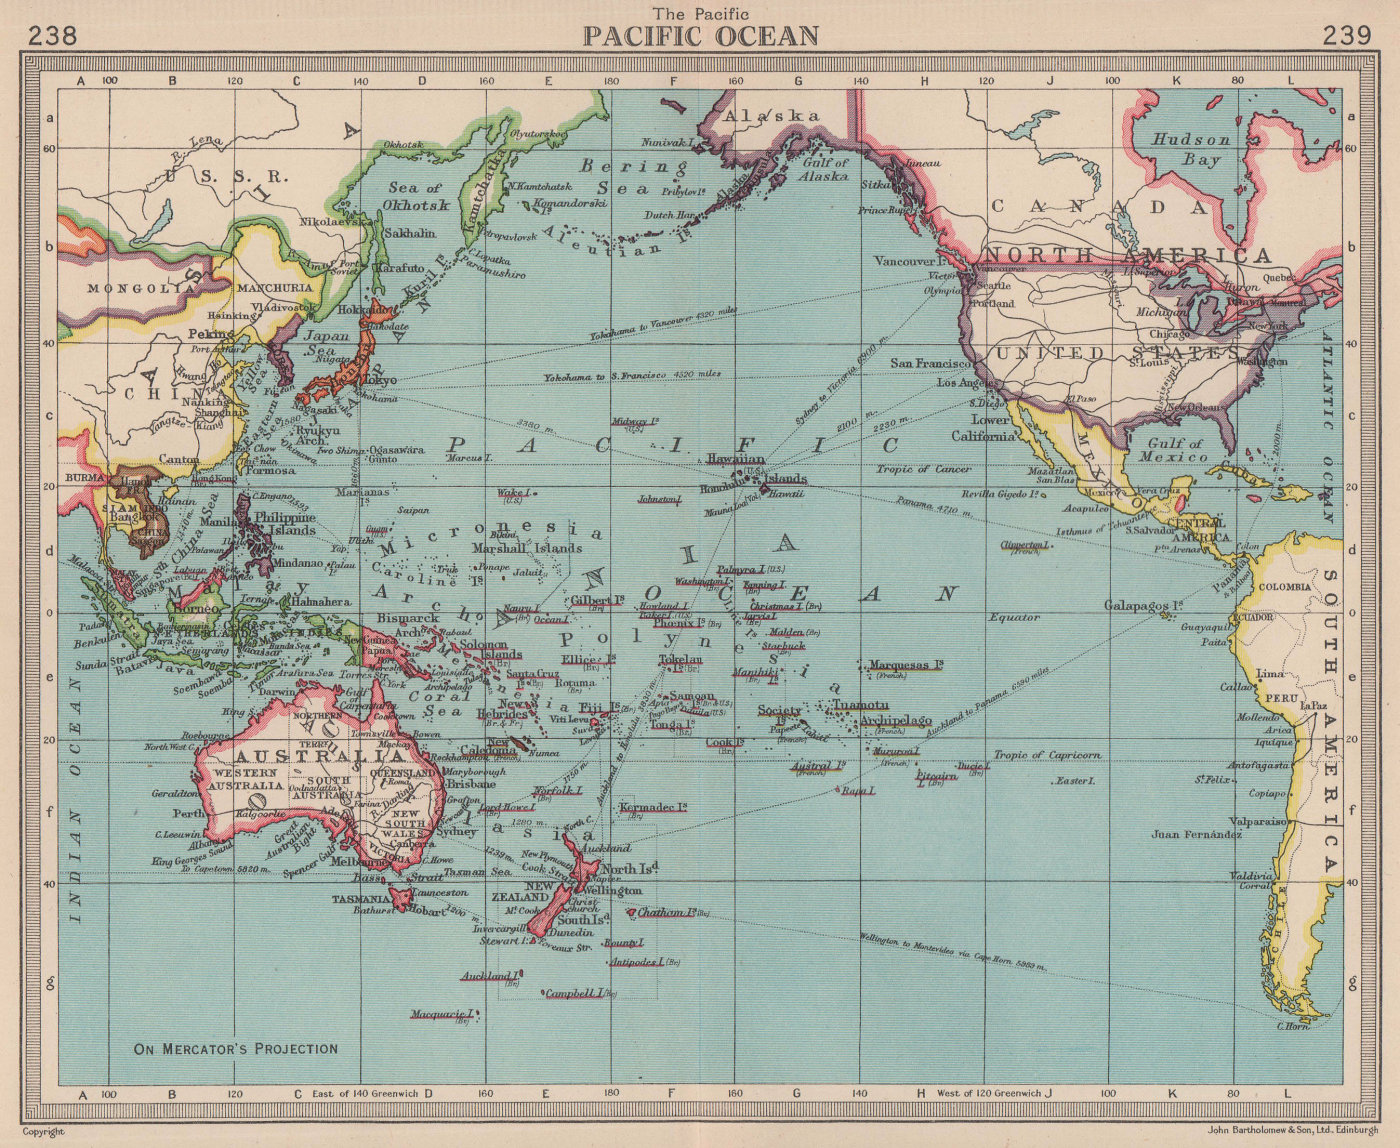 Pacific Ocean. BARTHOLOMEW 1949 old vintage map plan chart